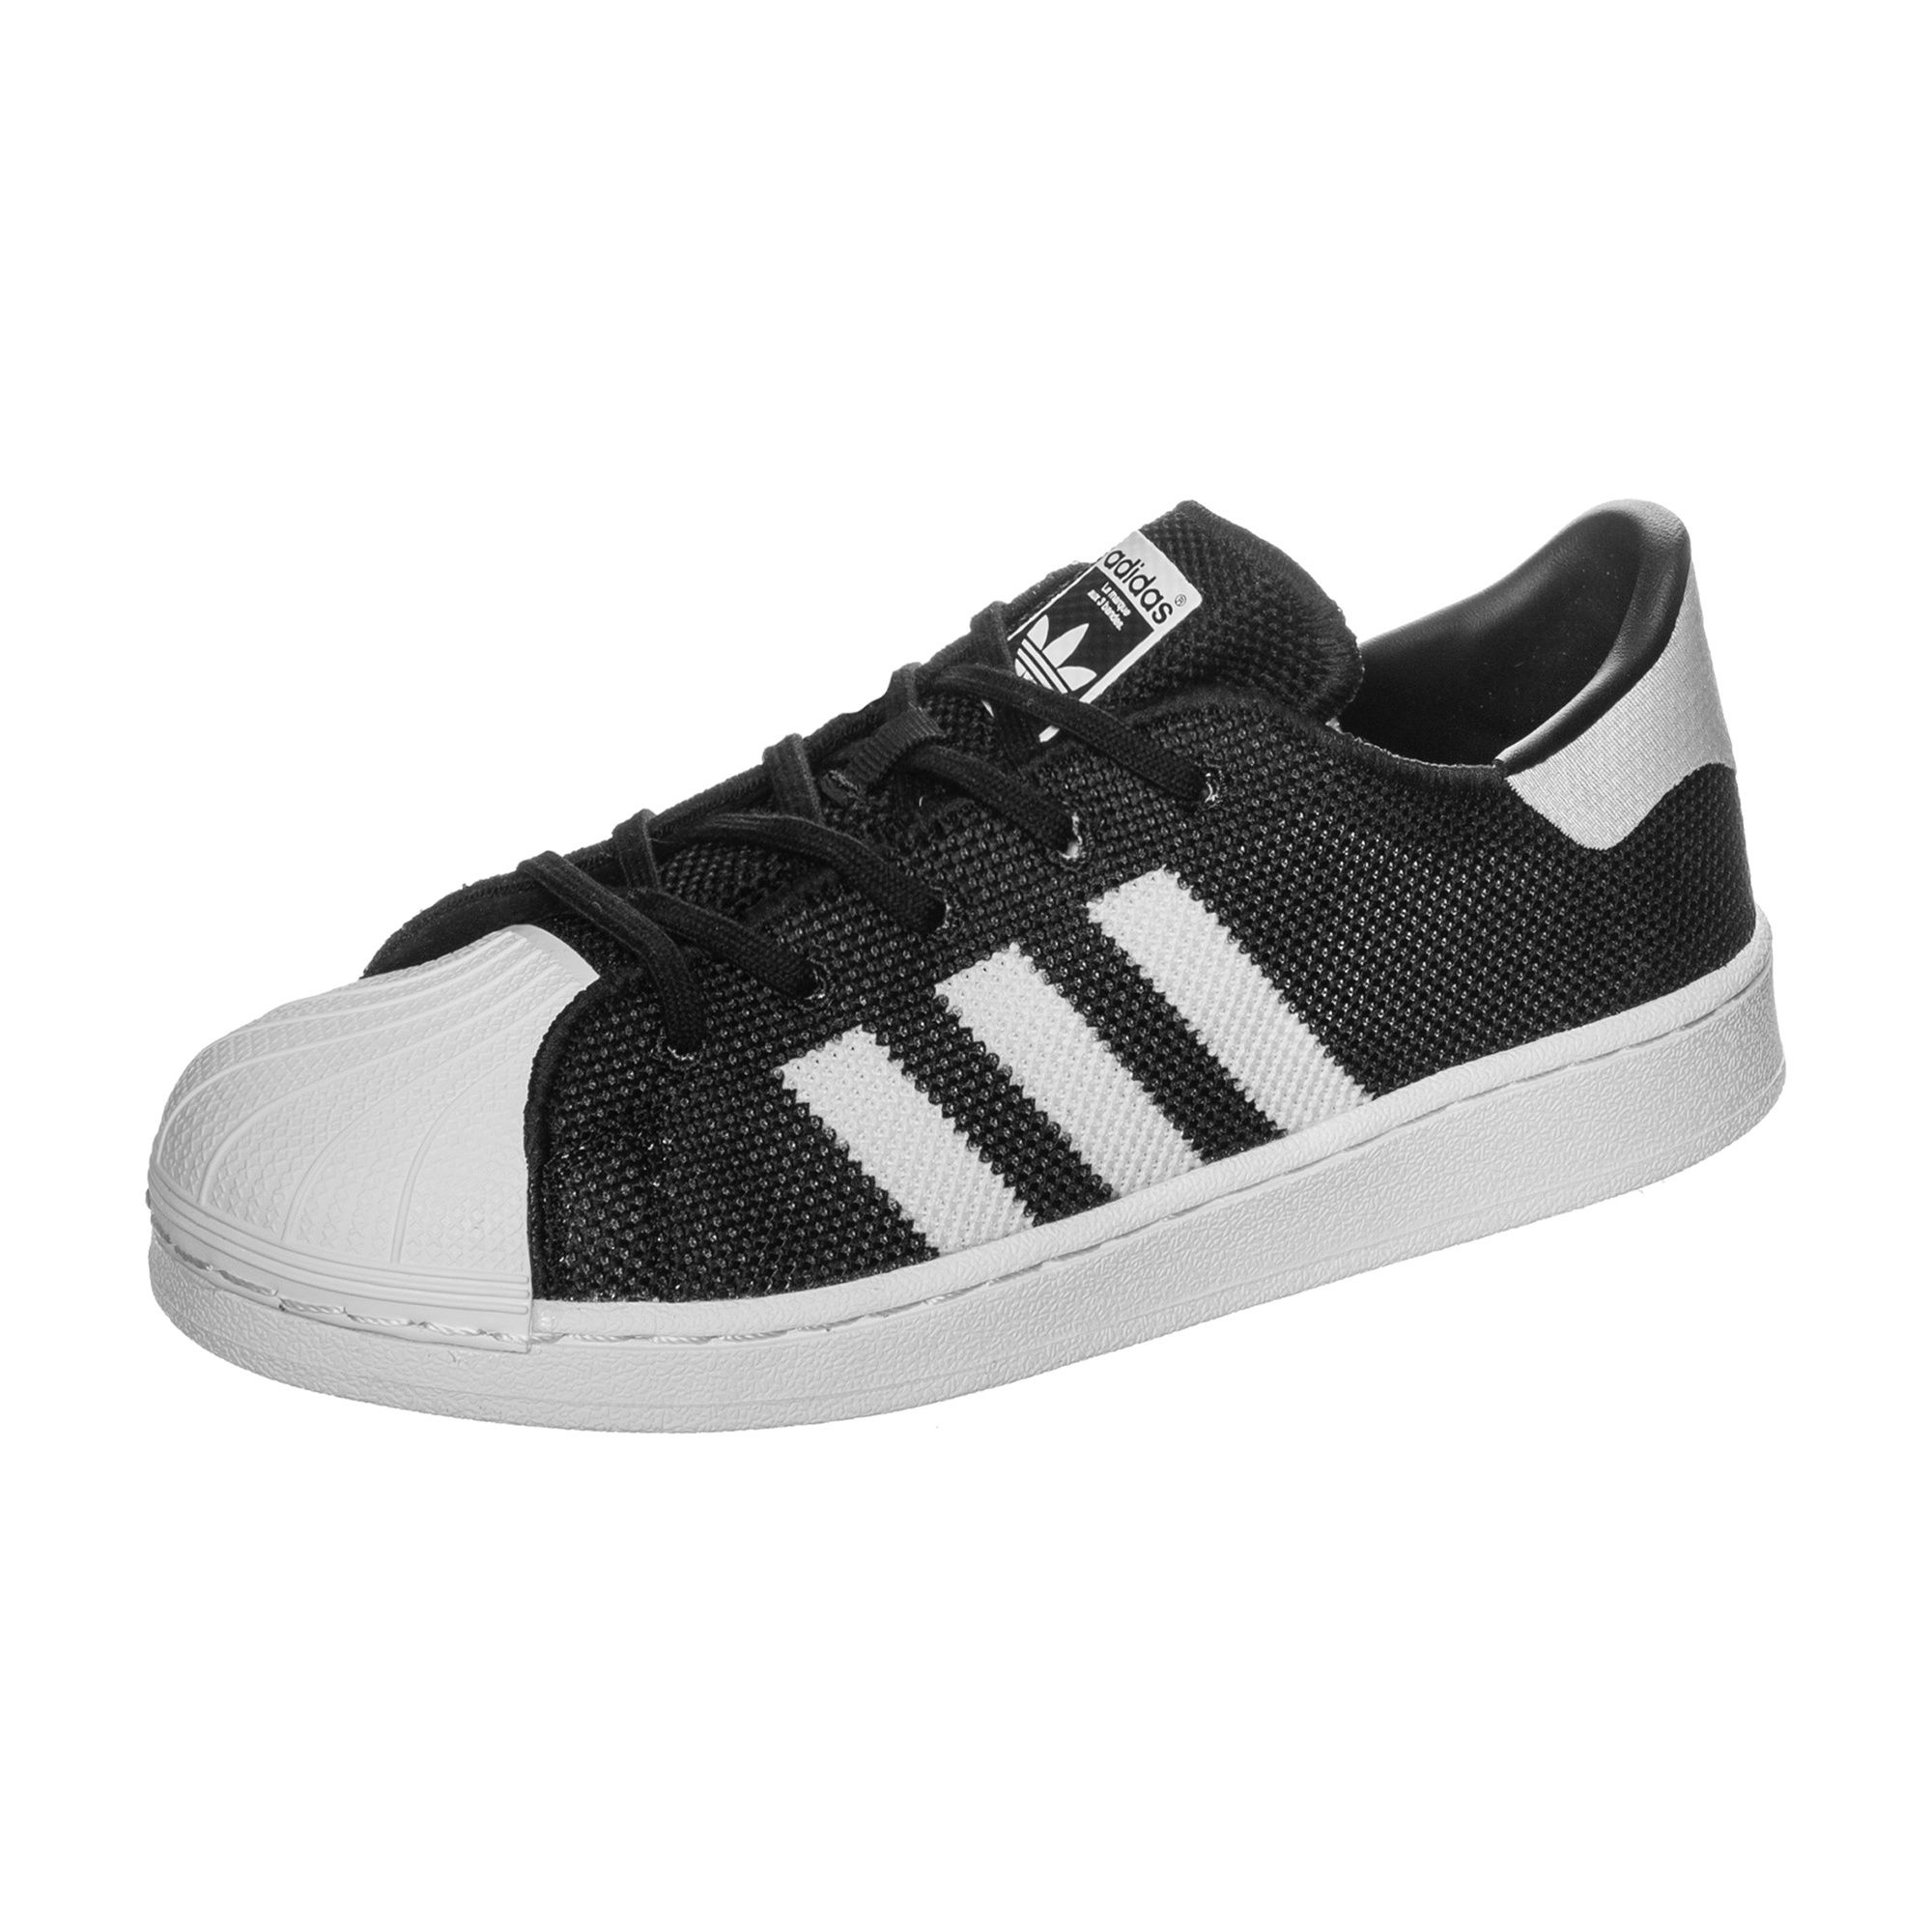 ADIDAS ORIGINALS adidas Originals Superstar Sneaker Kinder